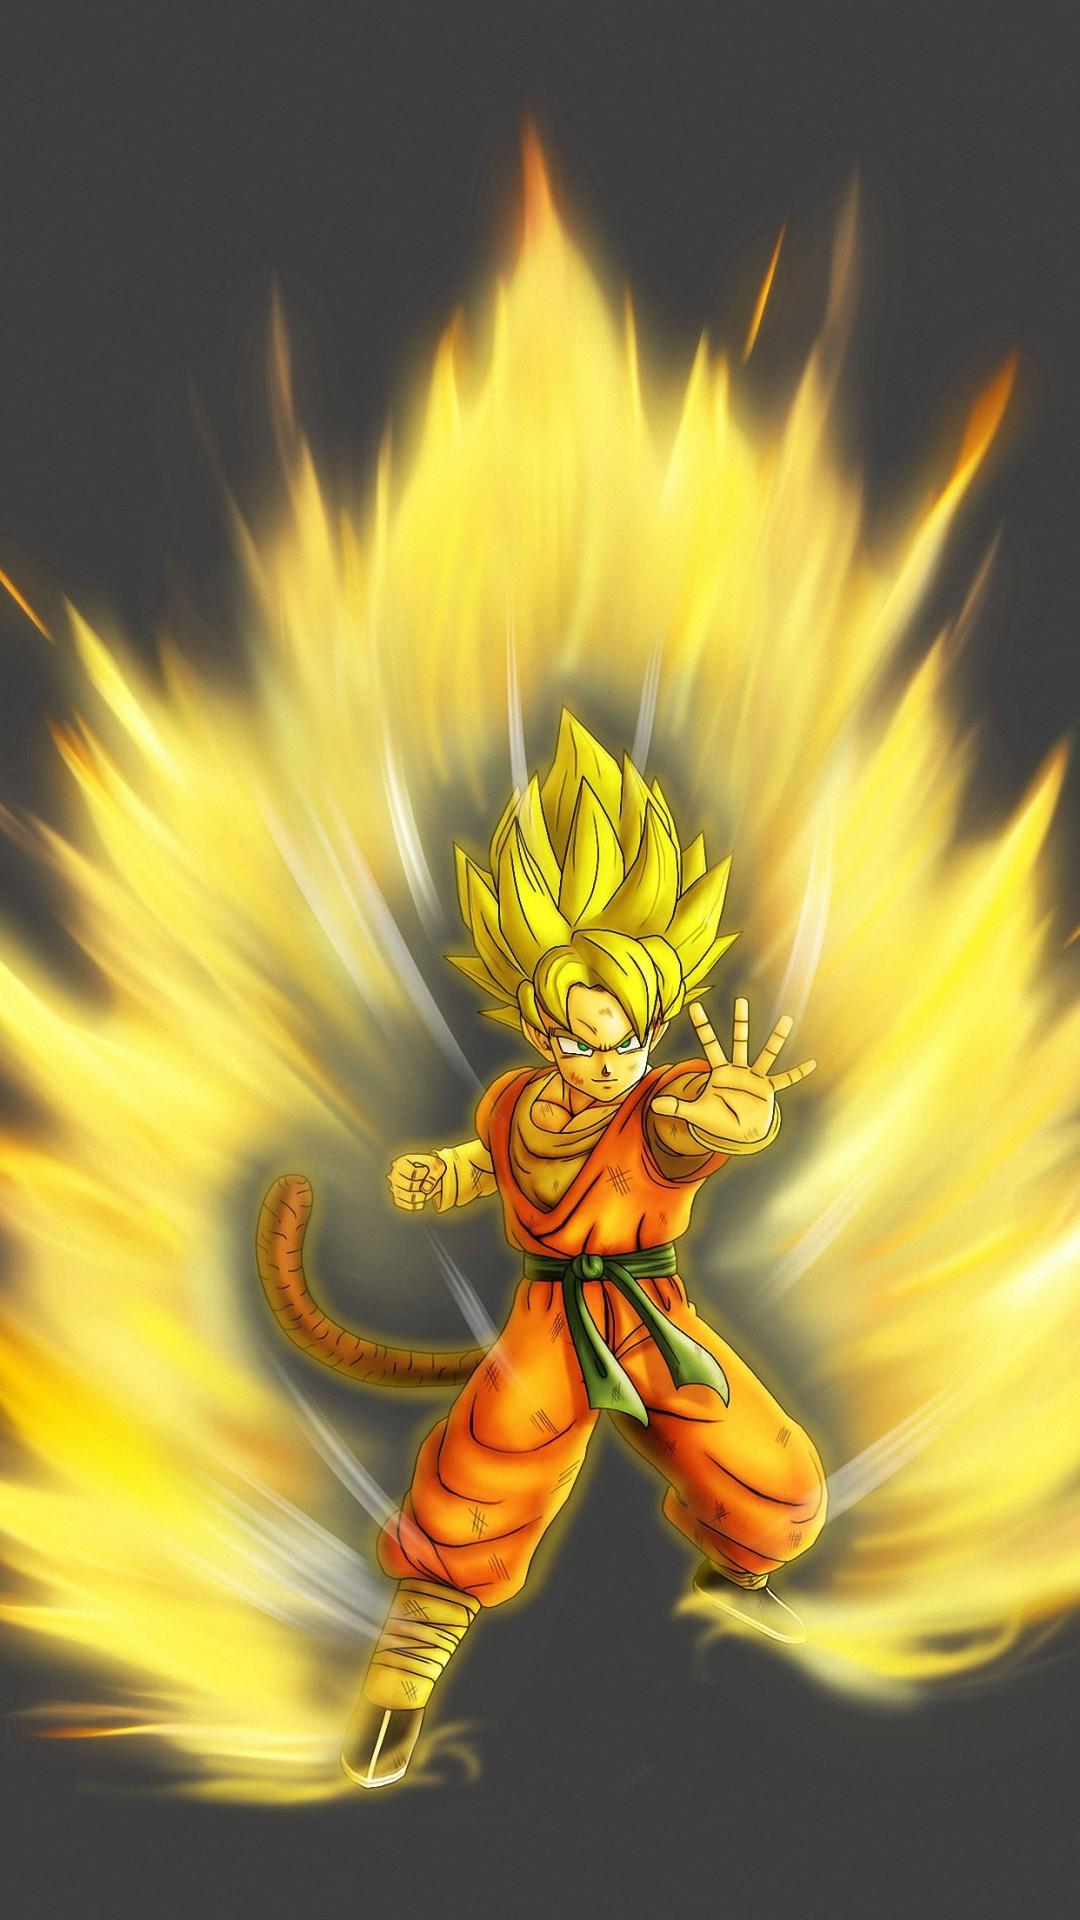 Image Result For Anime Live Wallpaper Dragon Ball Z